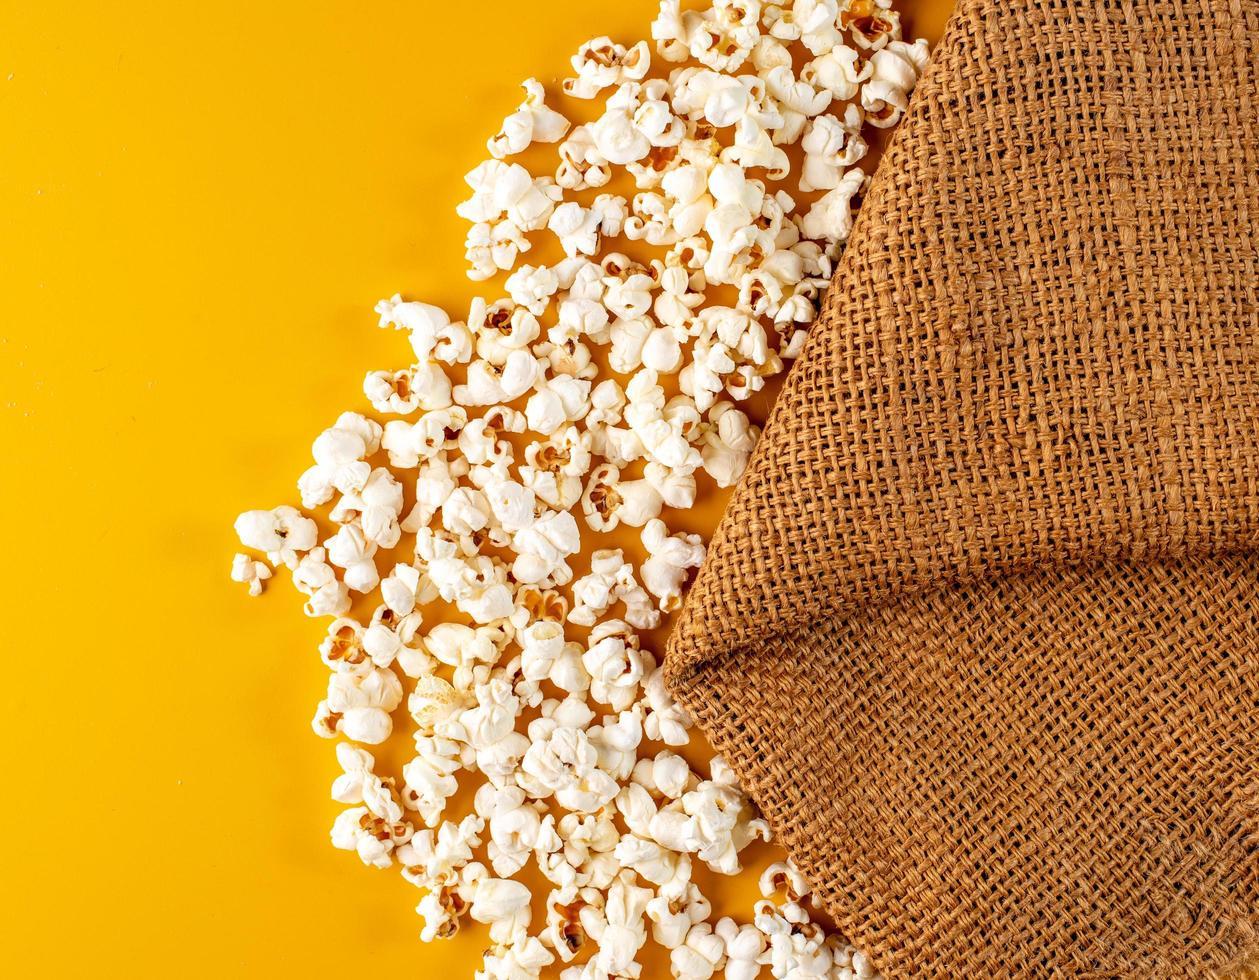 Popcorn on yellow background photo